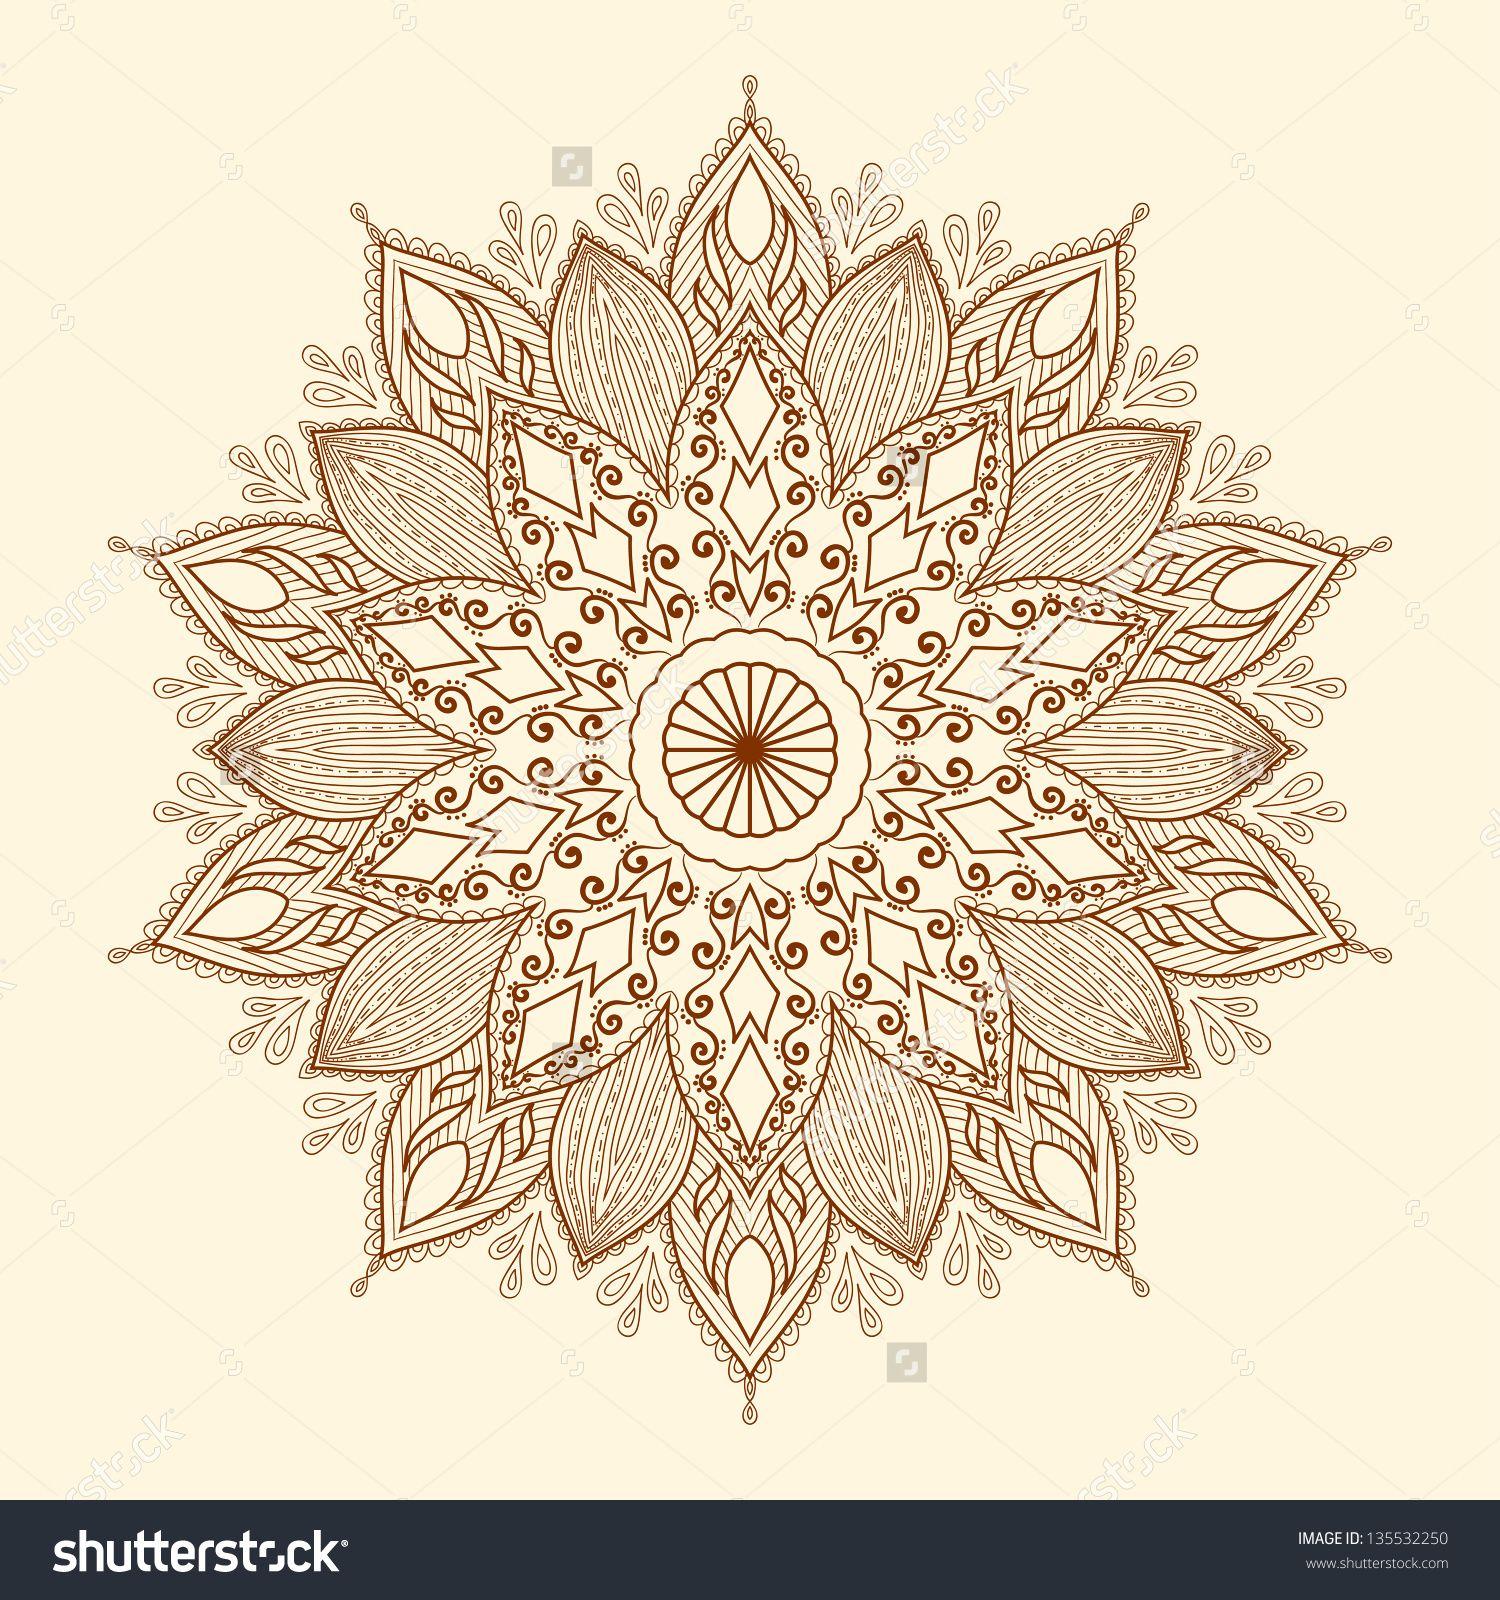 Mandala Dahlia Tattoo Designs Oranges Pinks And Yellows Dahlia Tattoo Mandala Flower Tattoos Mandala Tattoo Meaning